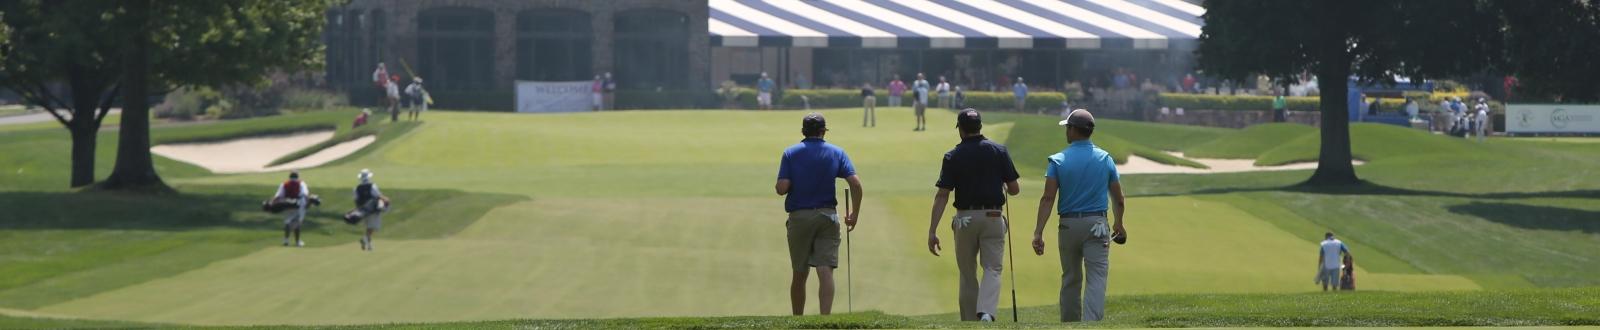 Golfers walking down the fairway